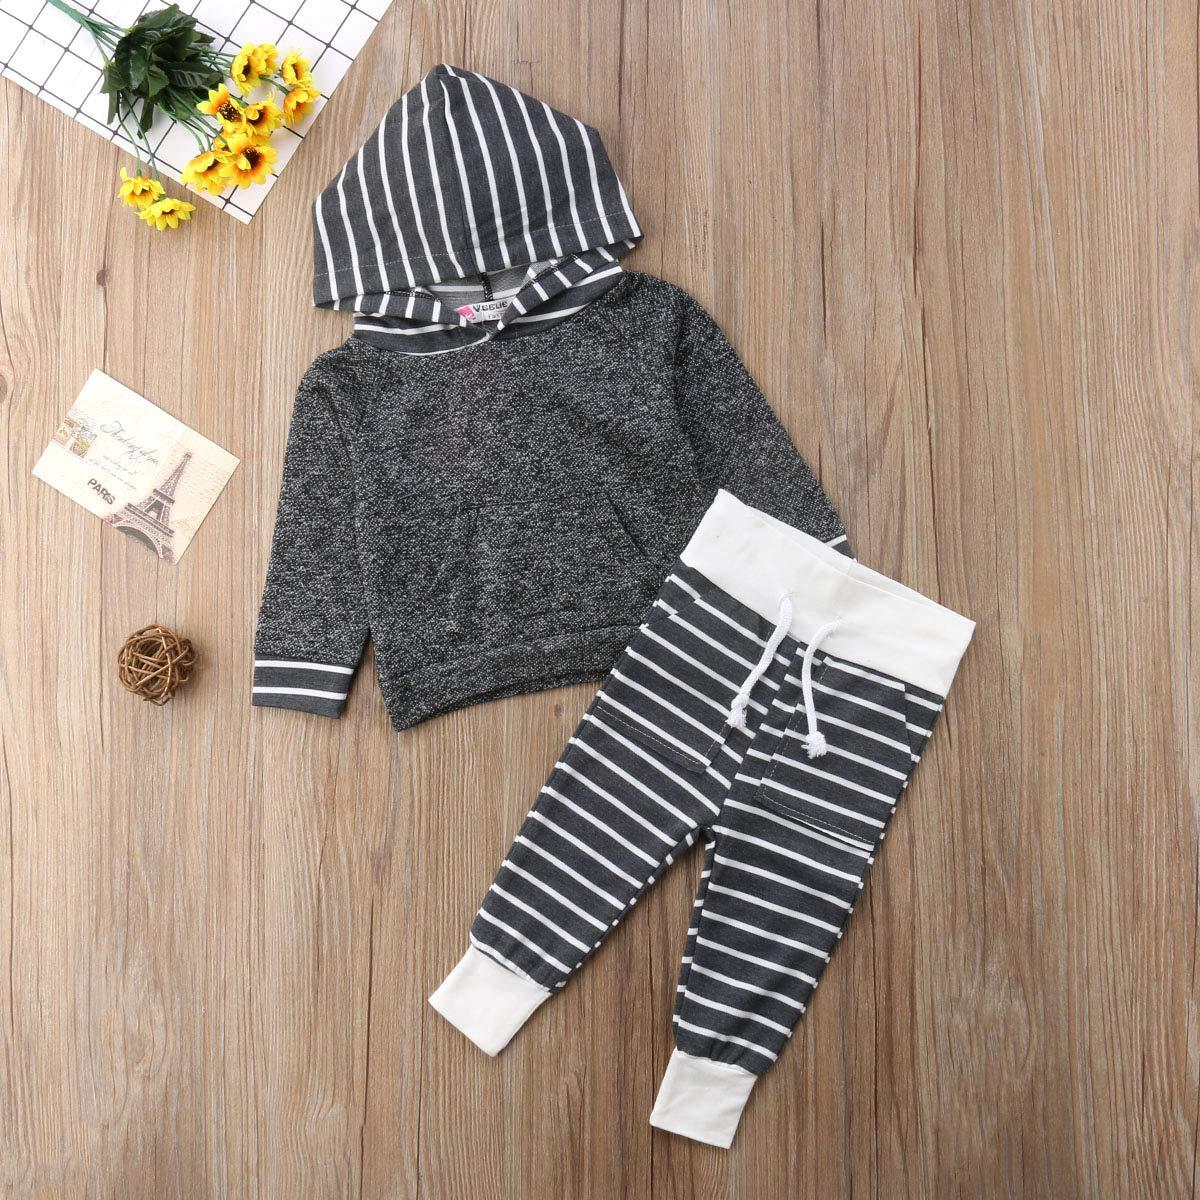 ca51fba4f70e ITFABS 2pcs Baby Boy Bodysuit Pants Set Black Romper Camouflage ...